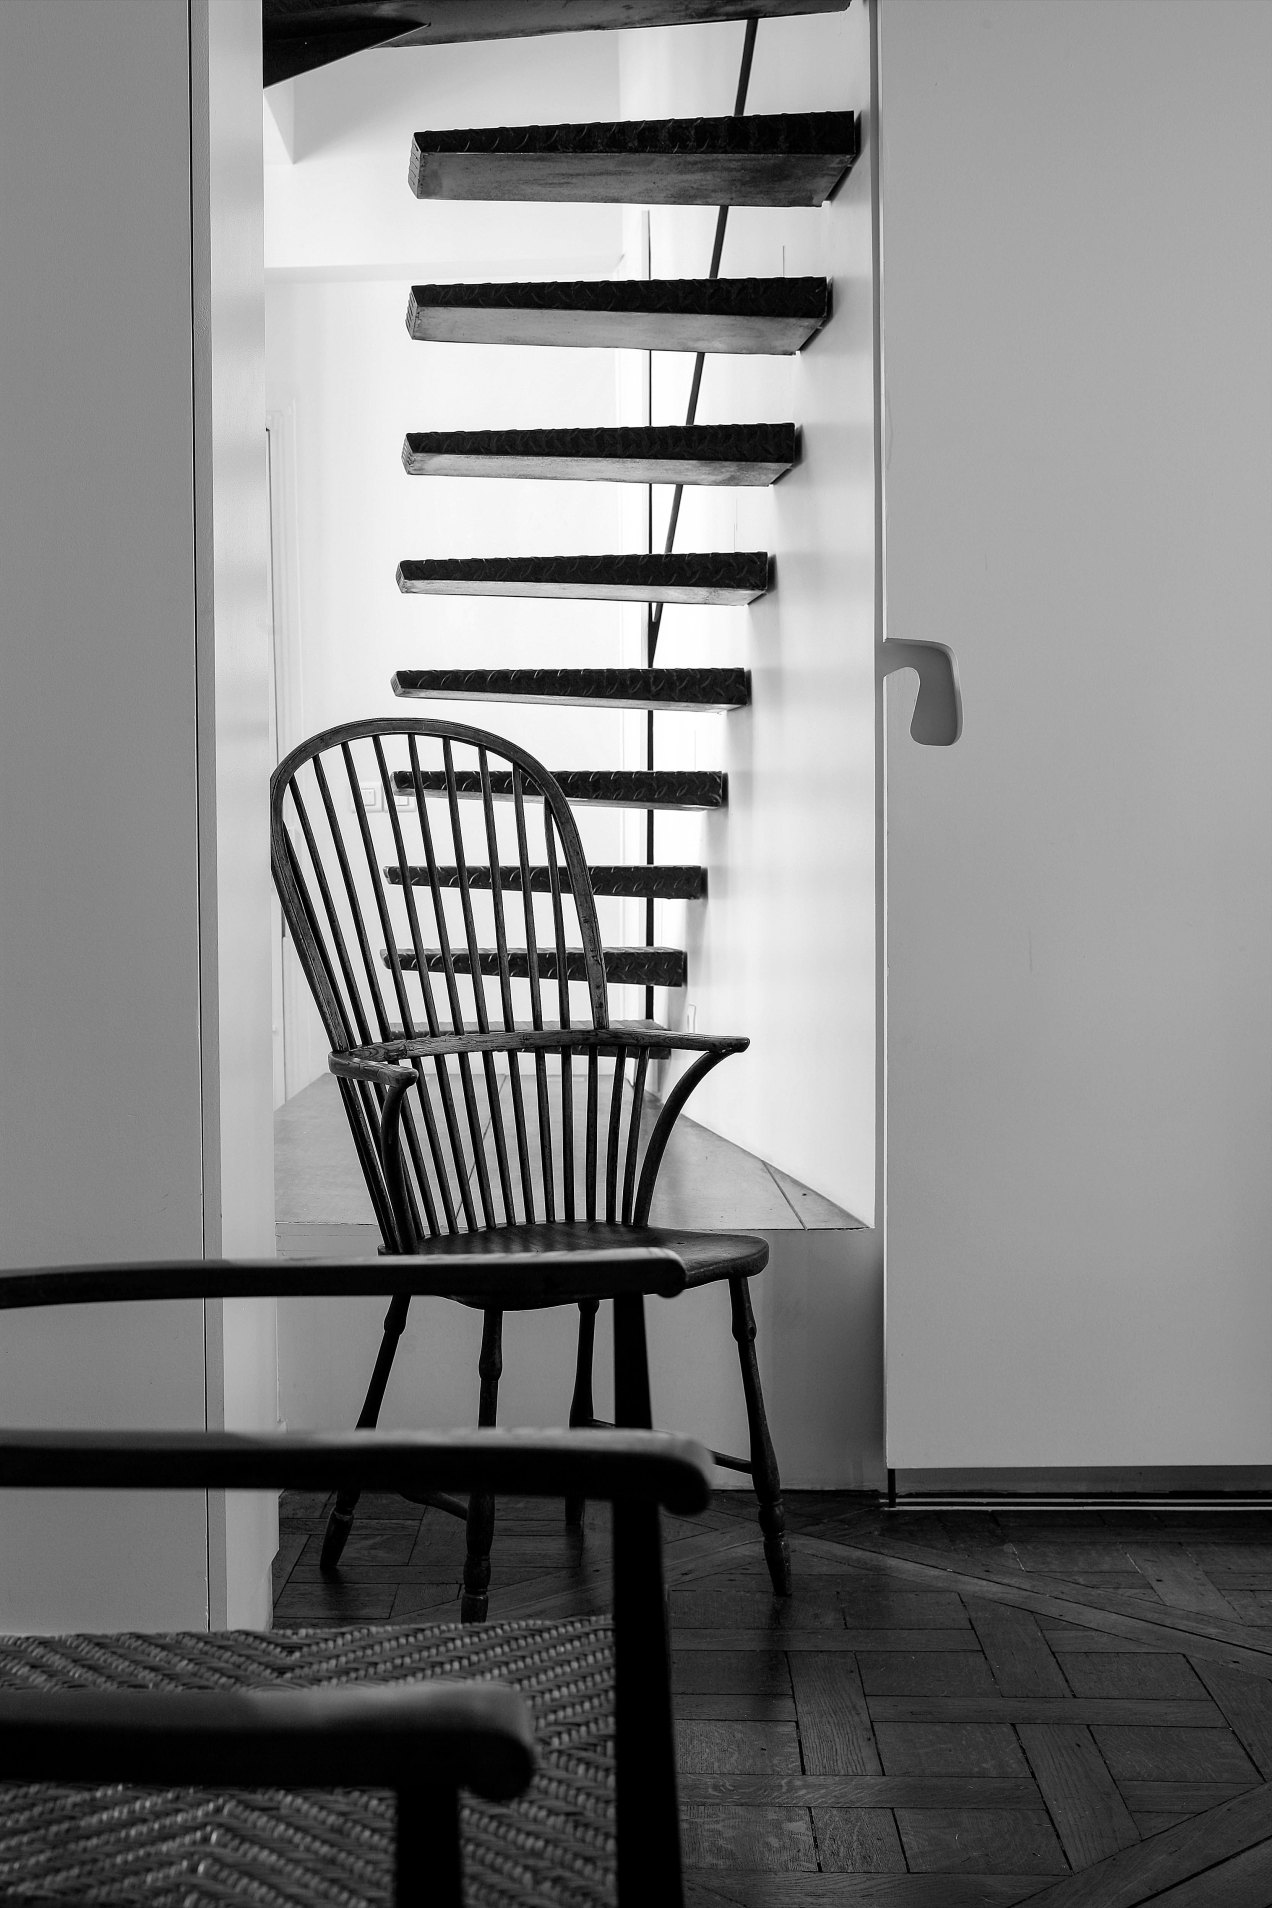 Pause,Frédéric Lebard, gildalliere, Paris, 2006